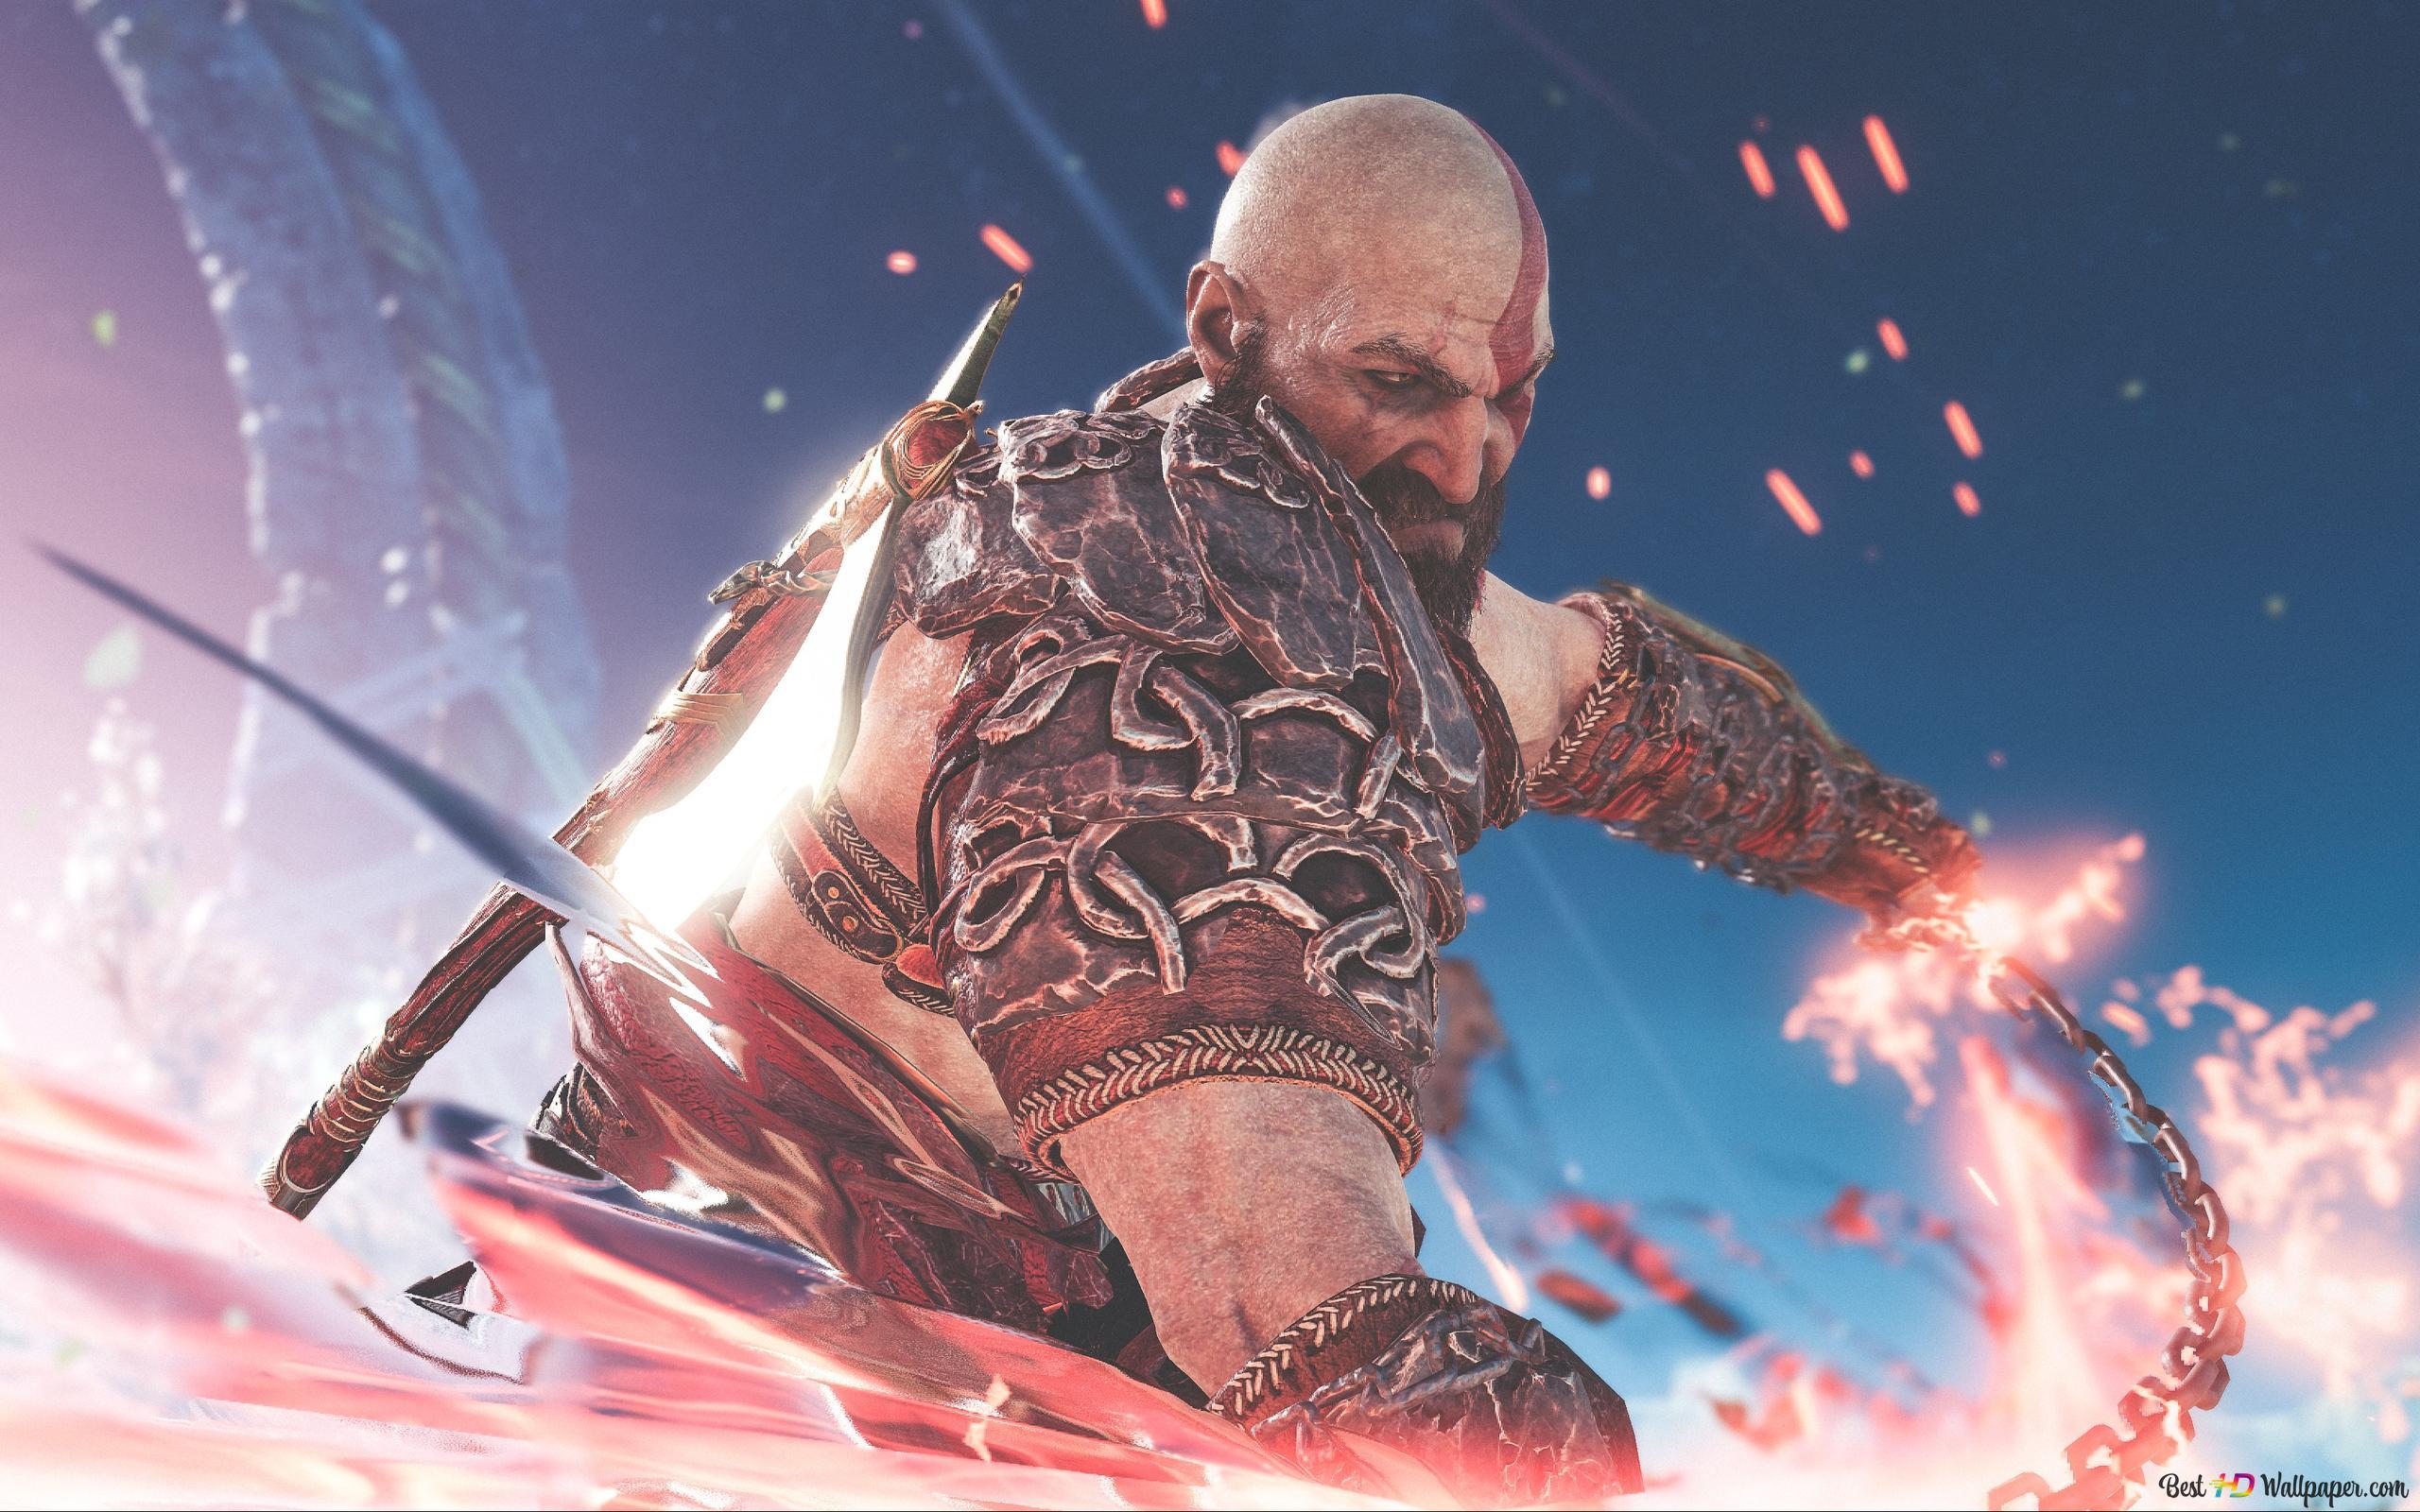 God Of War 4 Video Game Demigod Kratos Hd Wallpaper Download